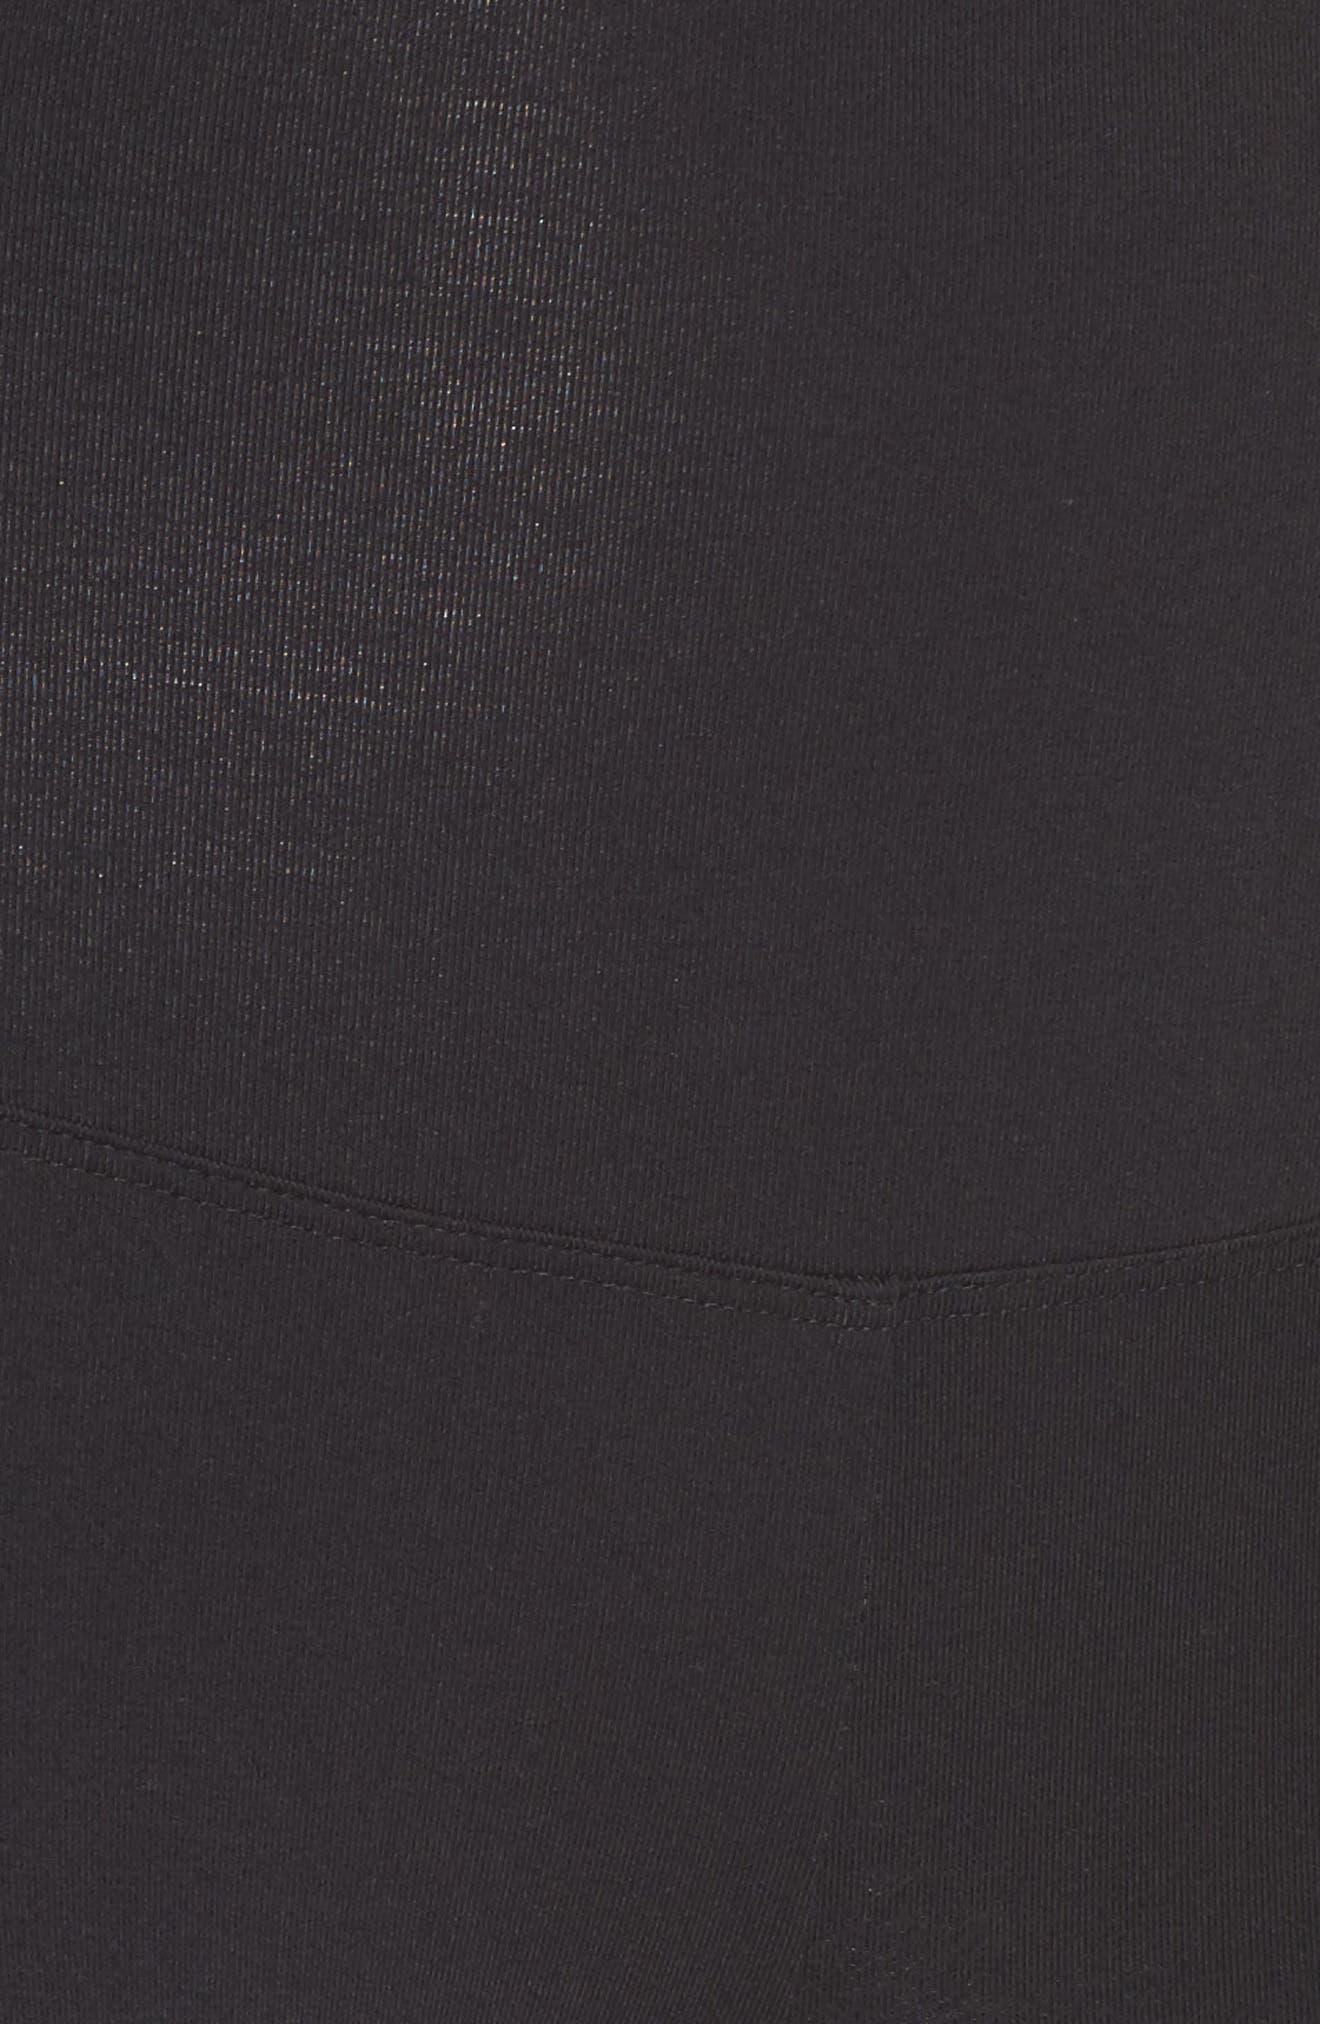 Signature High Waist Mesh Inset Leggings,                             Alternate thumbnail 5, color,                             Black